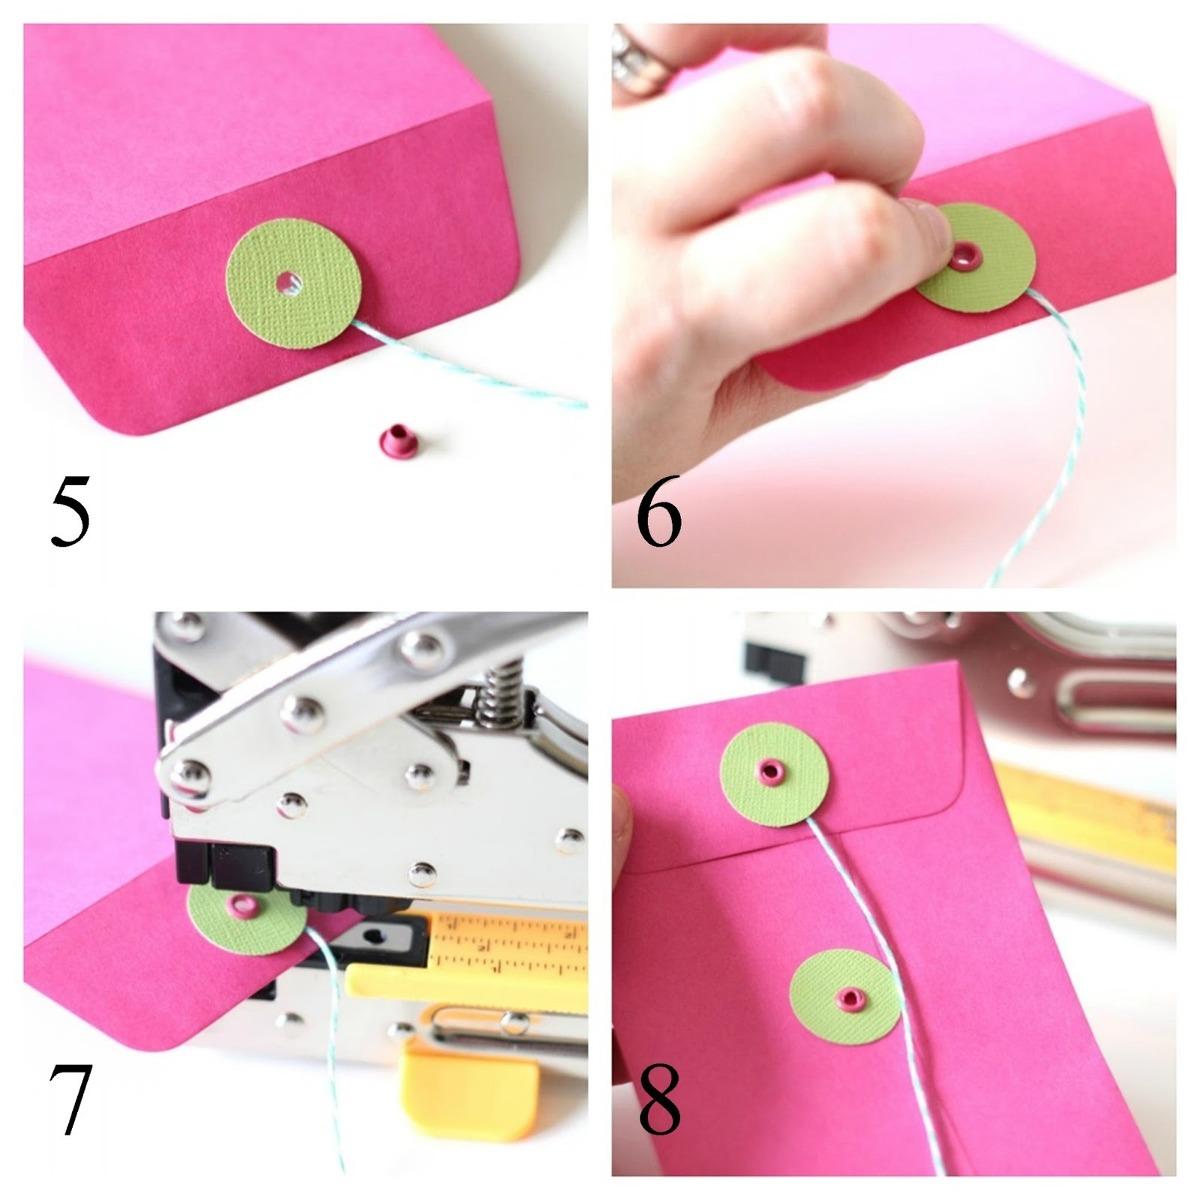 How to scrapbook eyelets - Scrapbook Estuche Kit Perforadora Crop A Dile Eyelet Ojillos